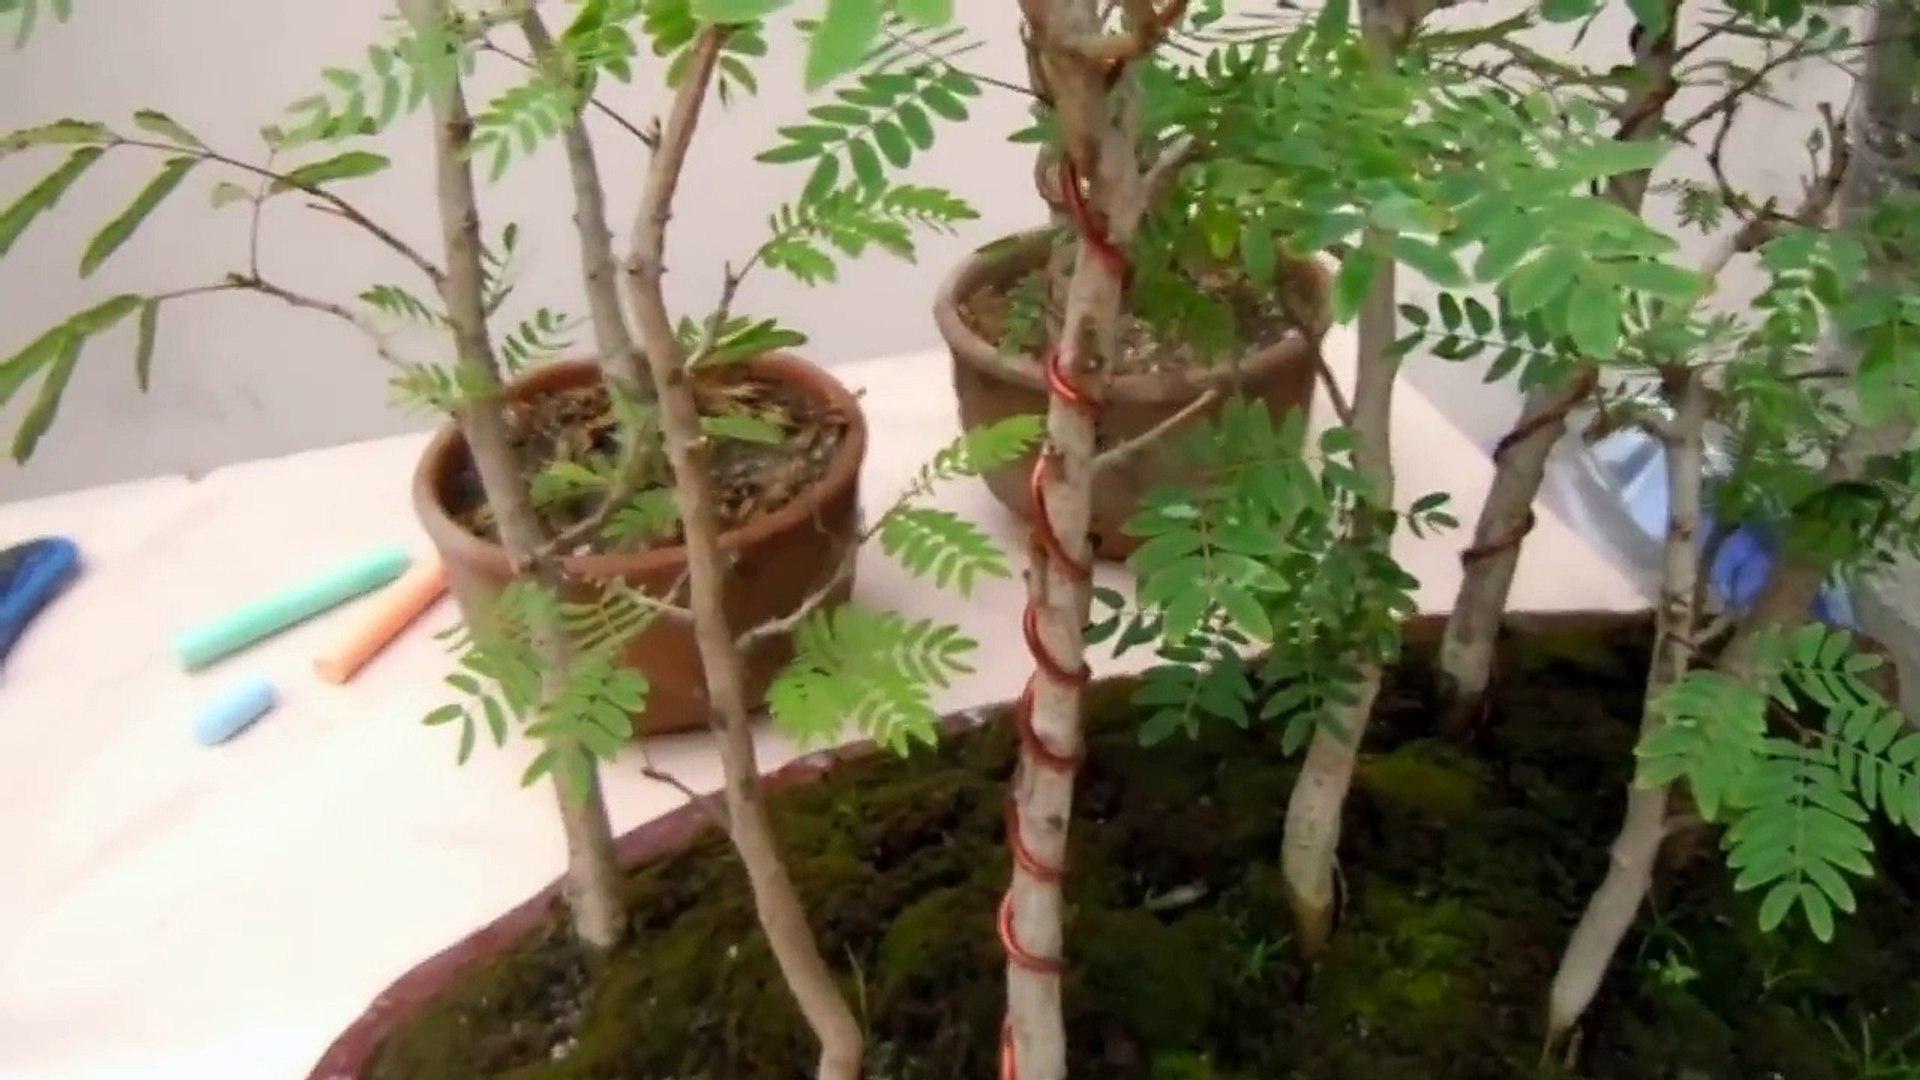 Bosques en miniatura 1° parte